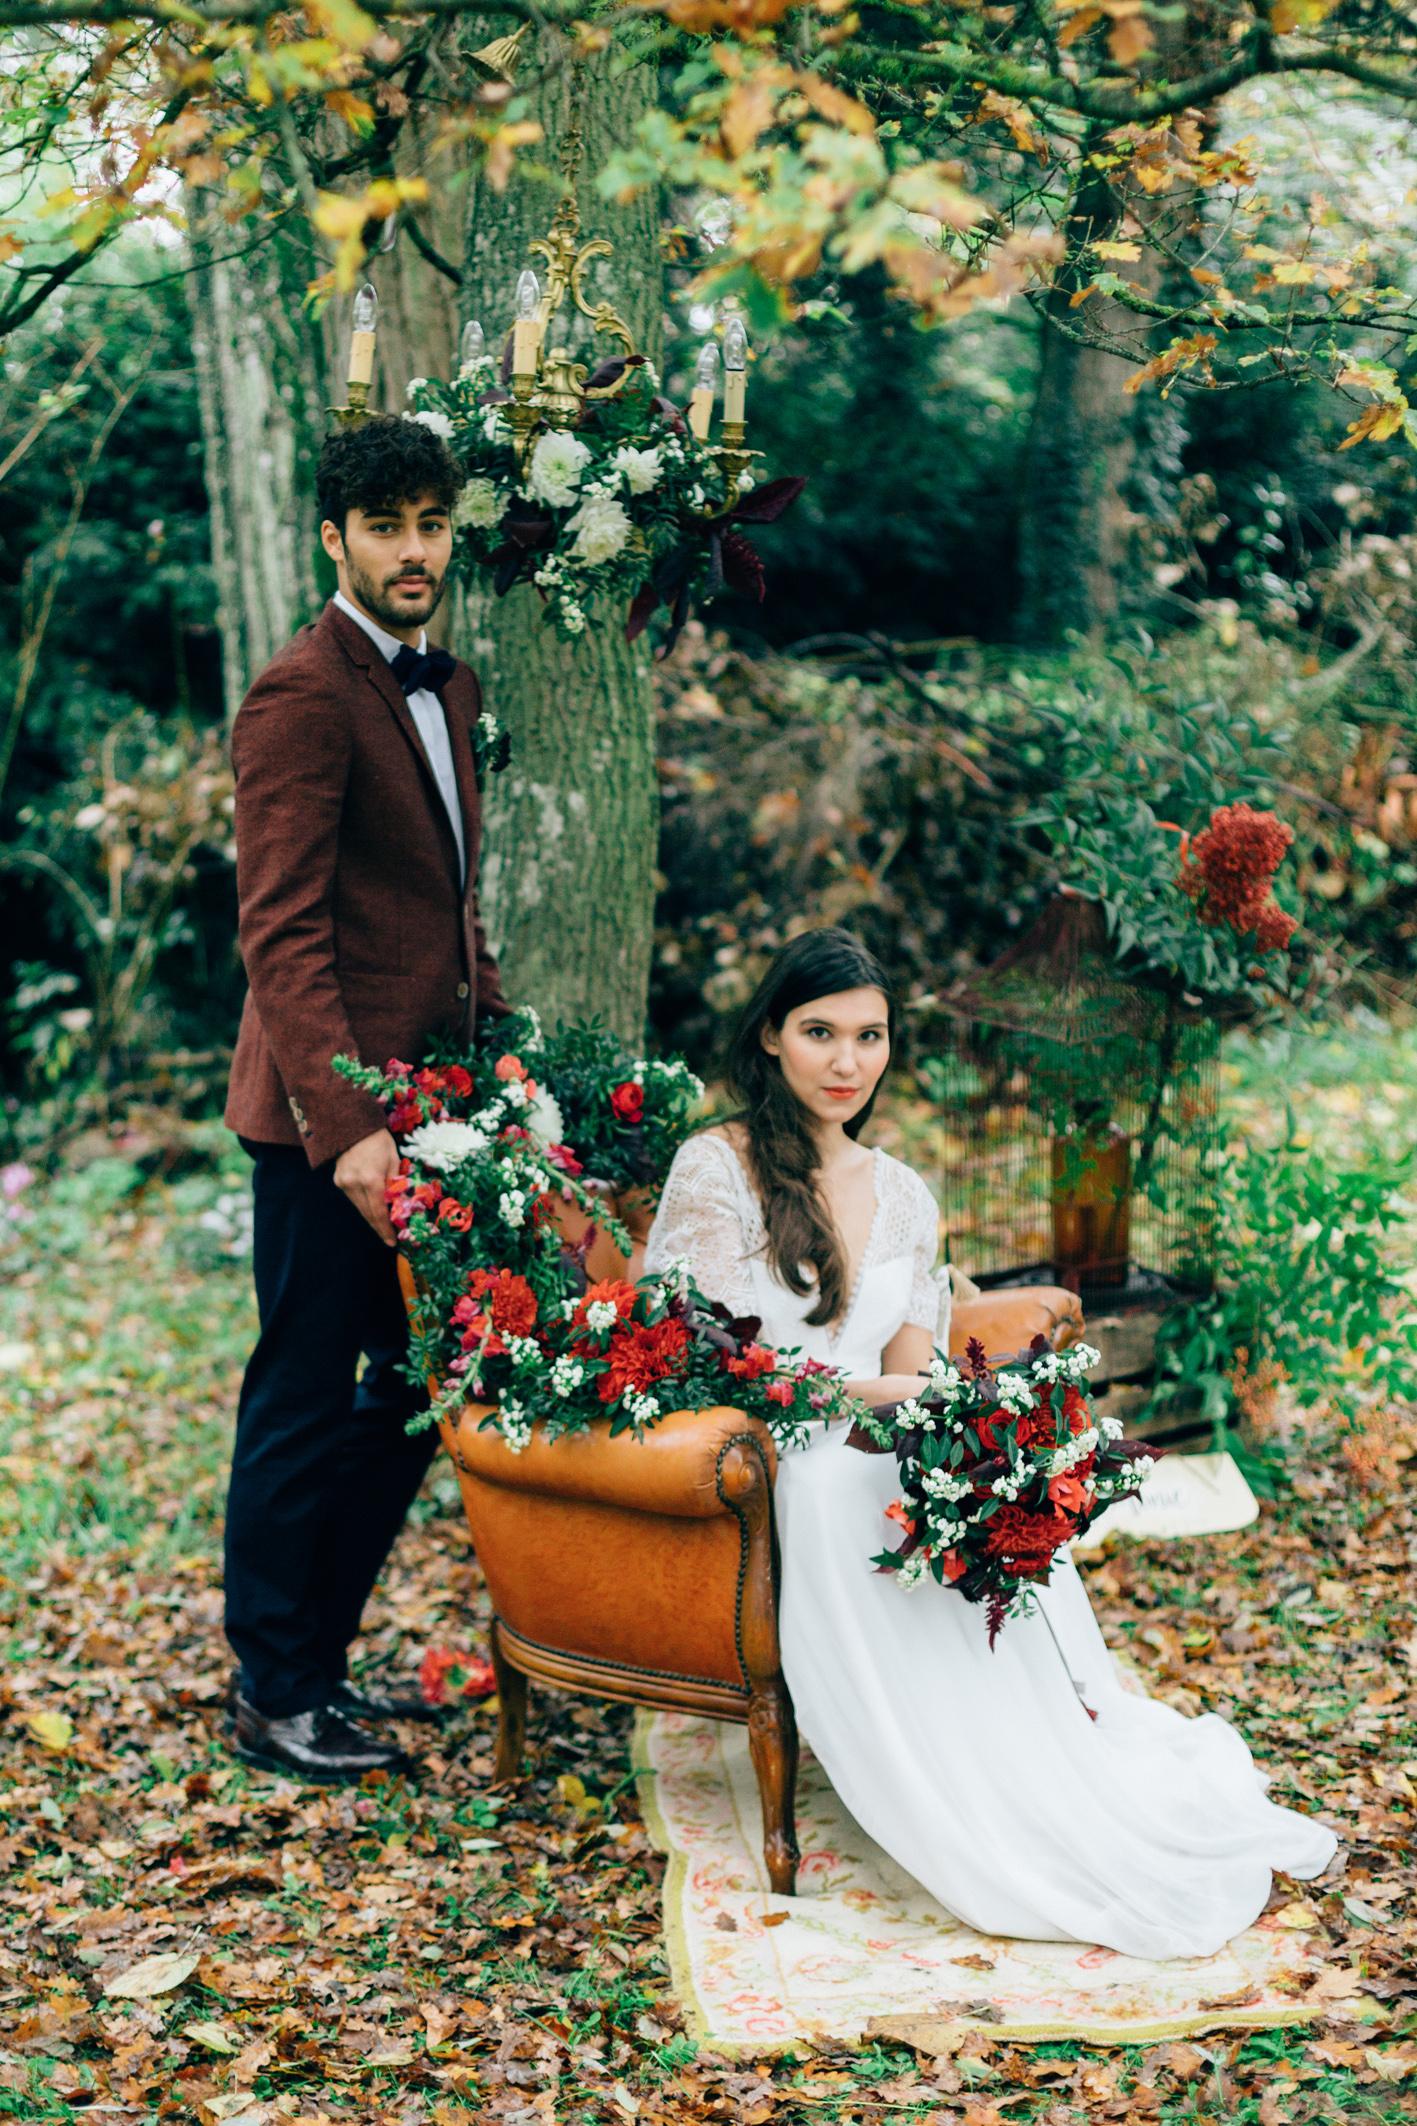 pierreatelier-photographe-mariage-bordeaux-wedding-planner-style-me-pretty